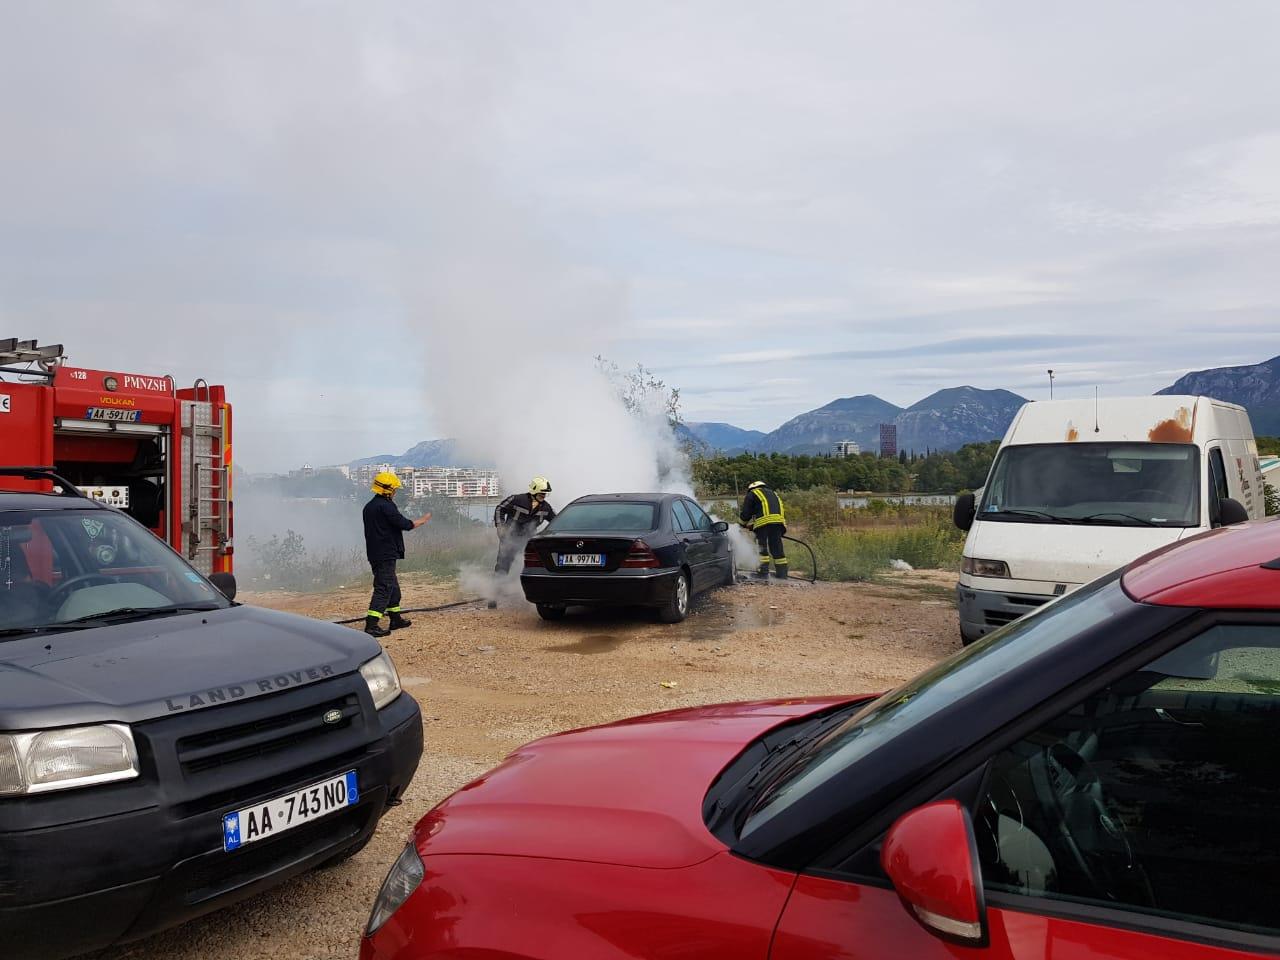 Digjet makina te liqeni i thate policit i mbaron bombla zjarrfikese (3)